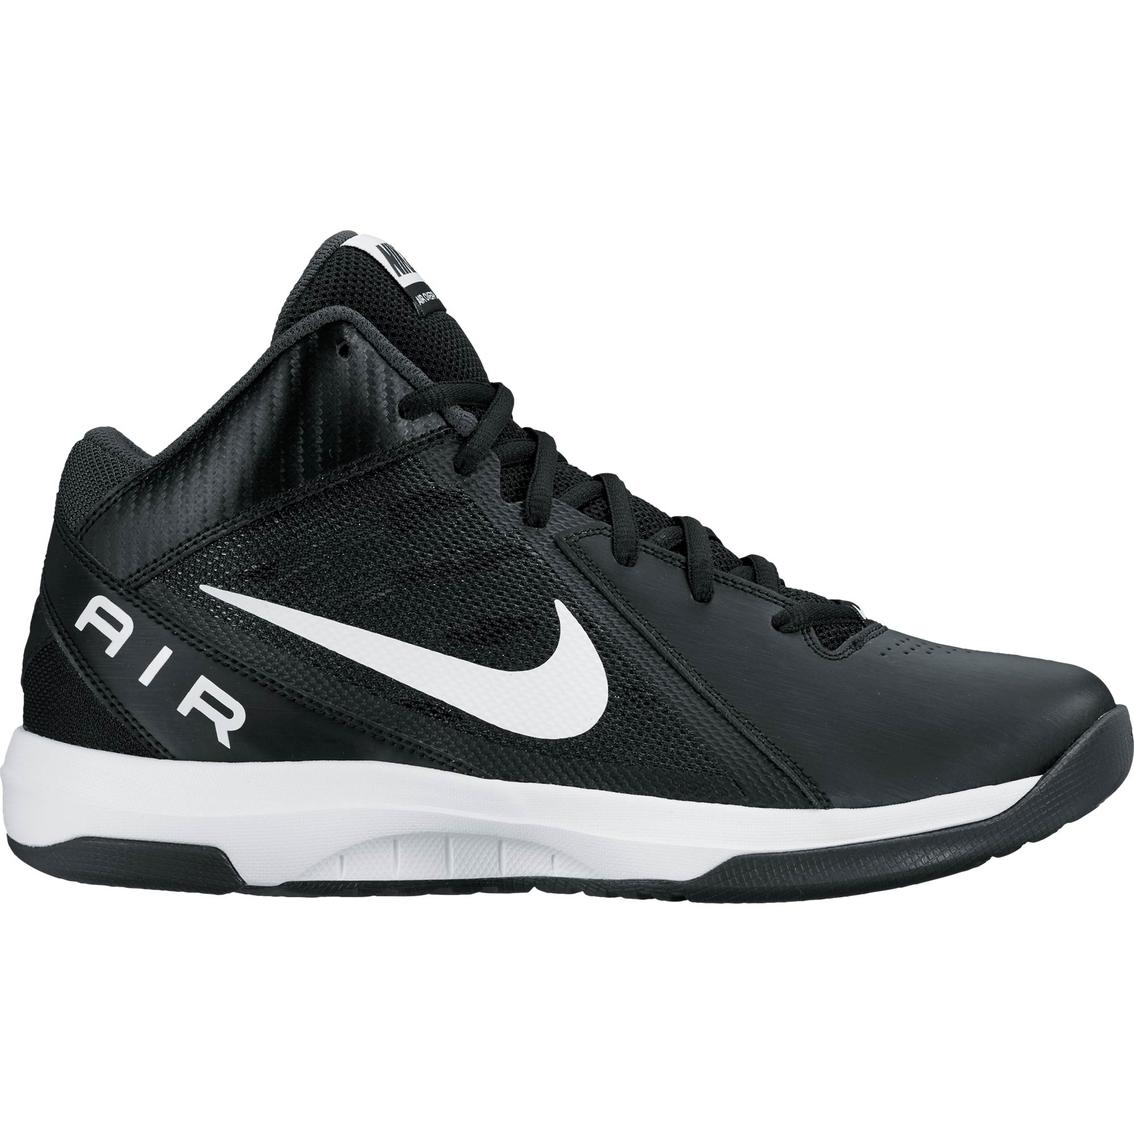 614236f8387 Nike Men s Air Overplay Ix Basketball Shoes